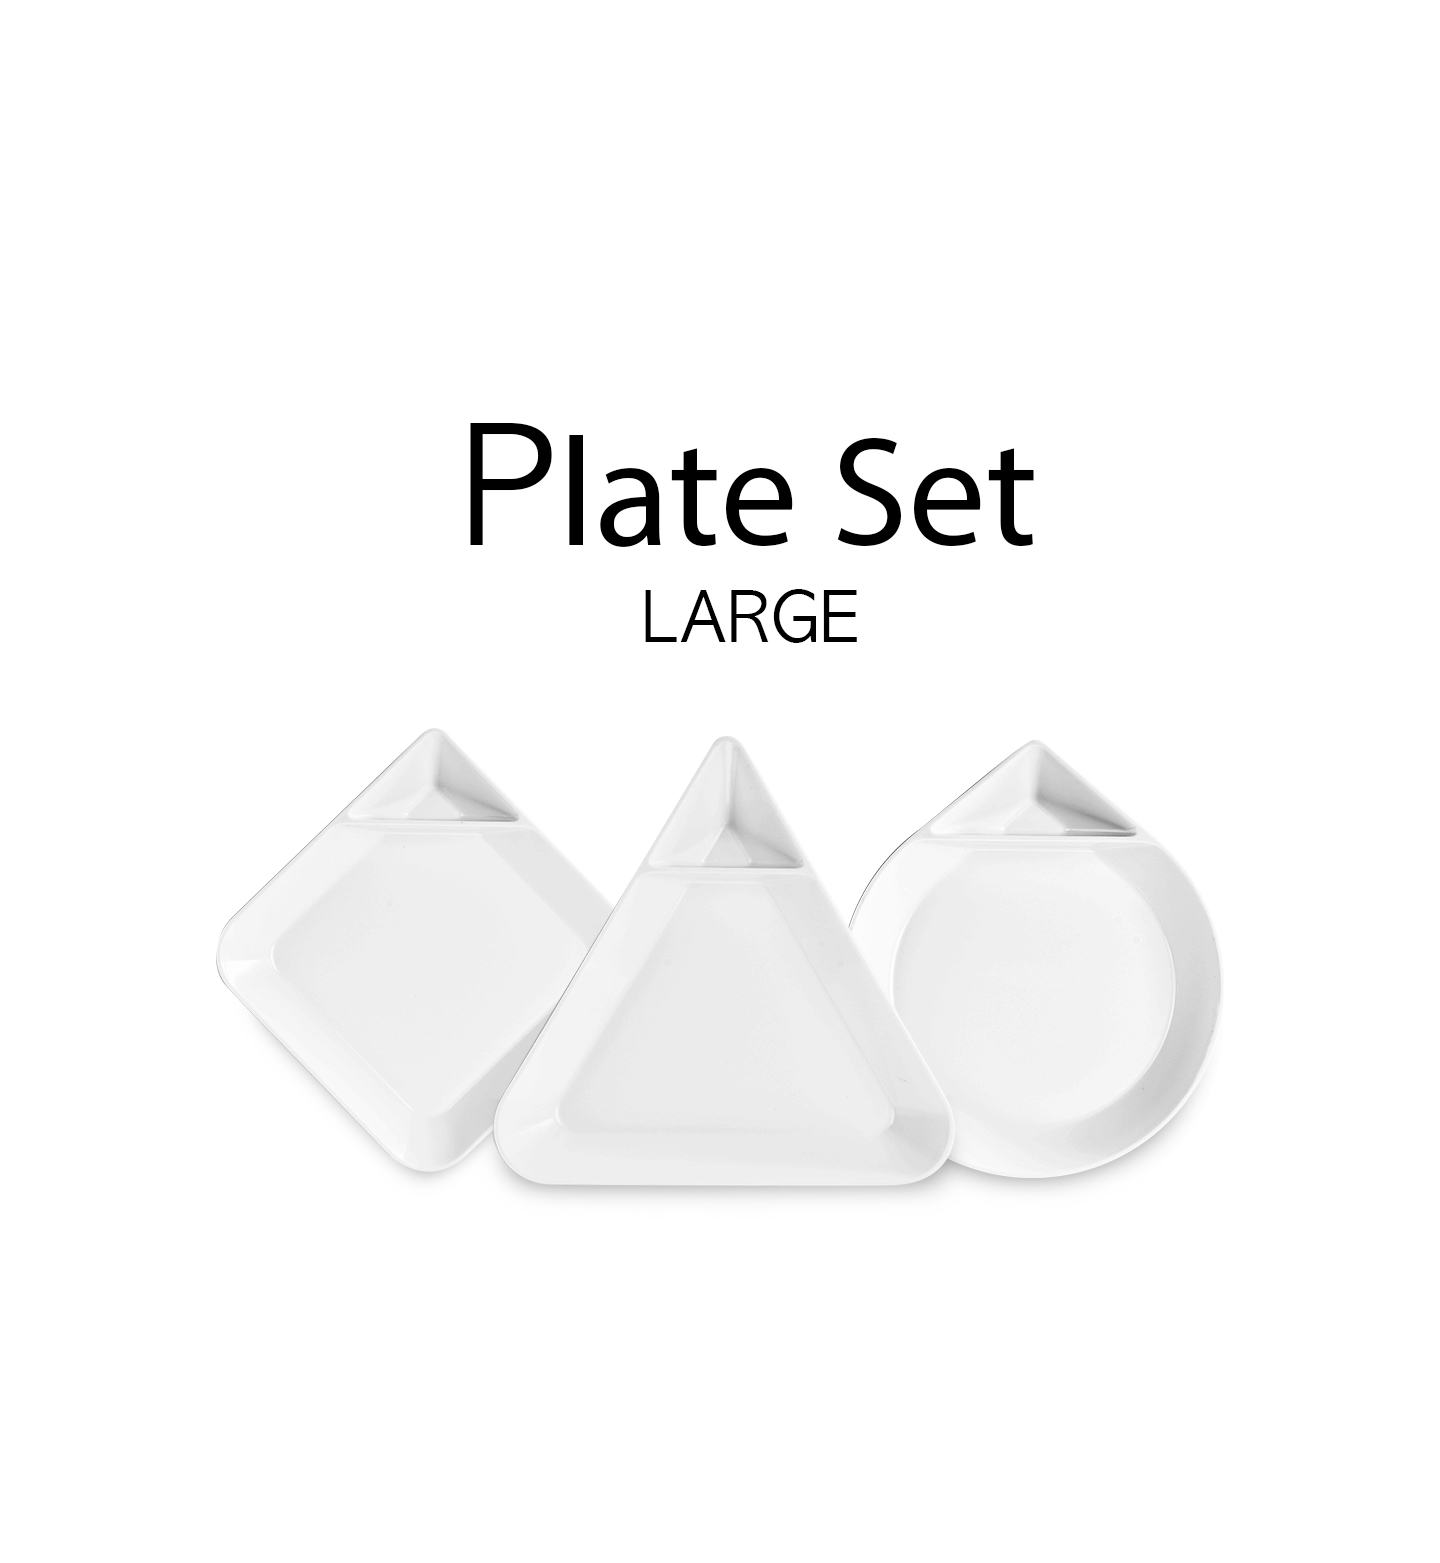 Plate Set Large 03